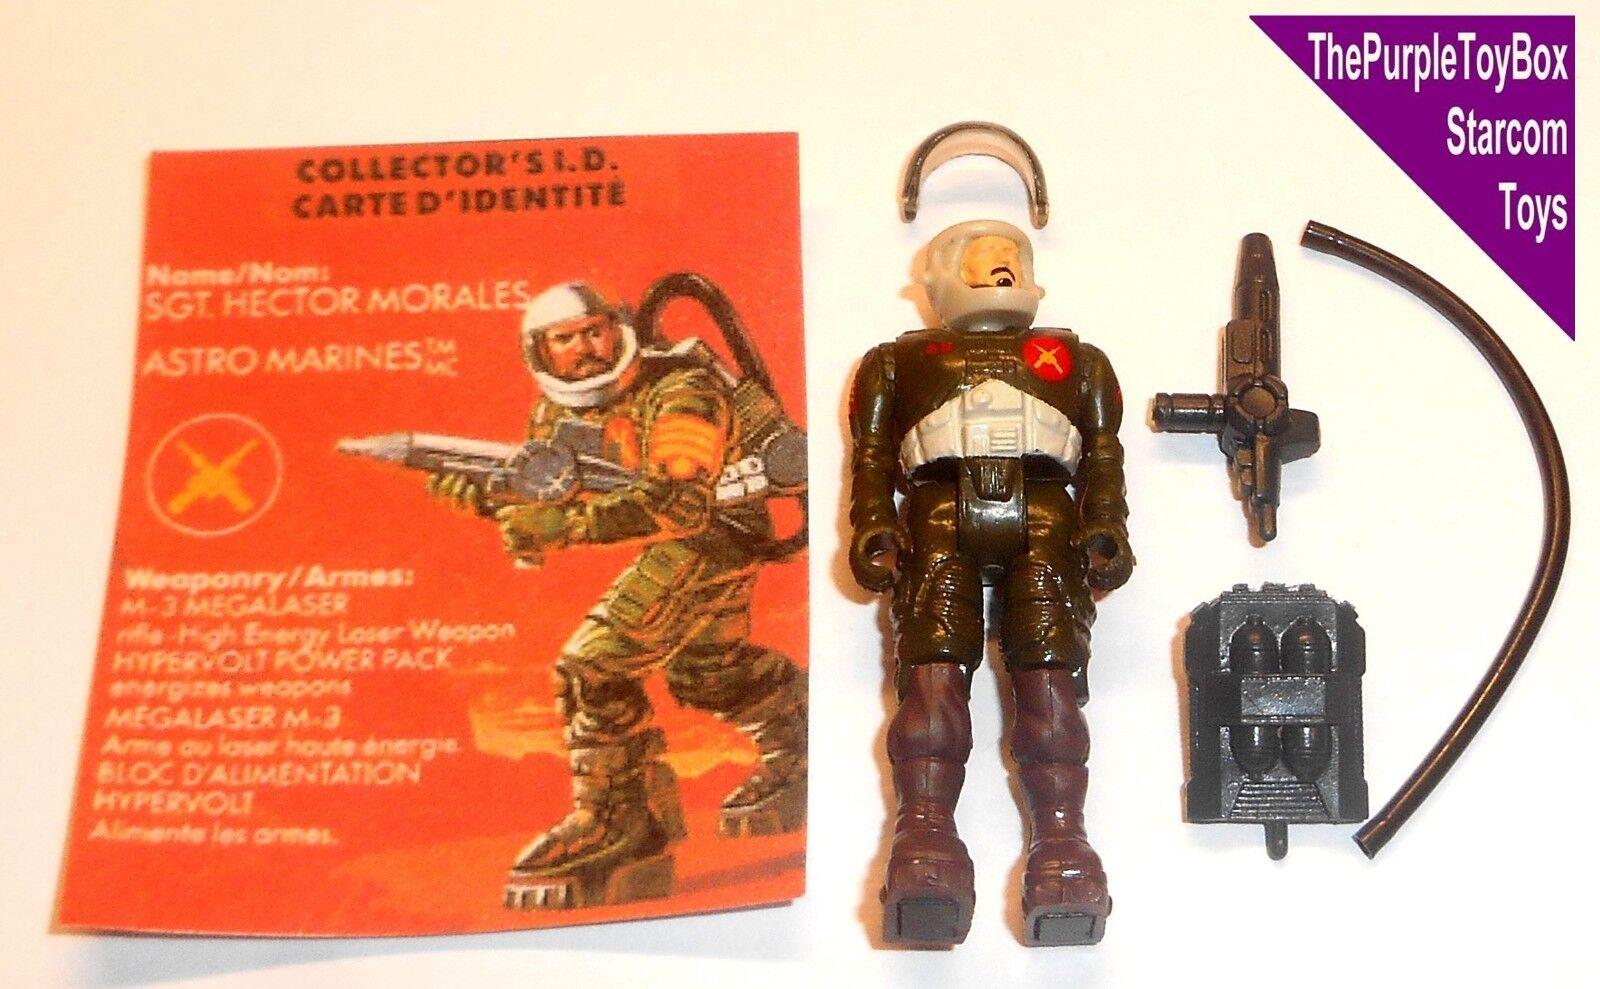 (E037) Vintage 1980's Starcom Toys  SGT. HECTOR MORALES  Astro Marines